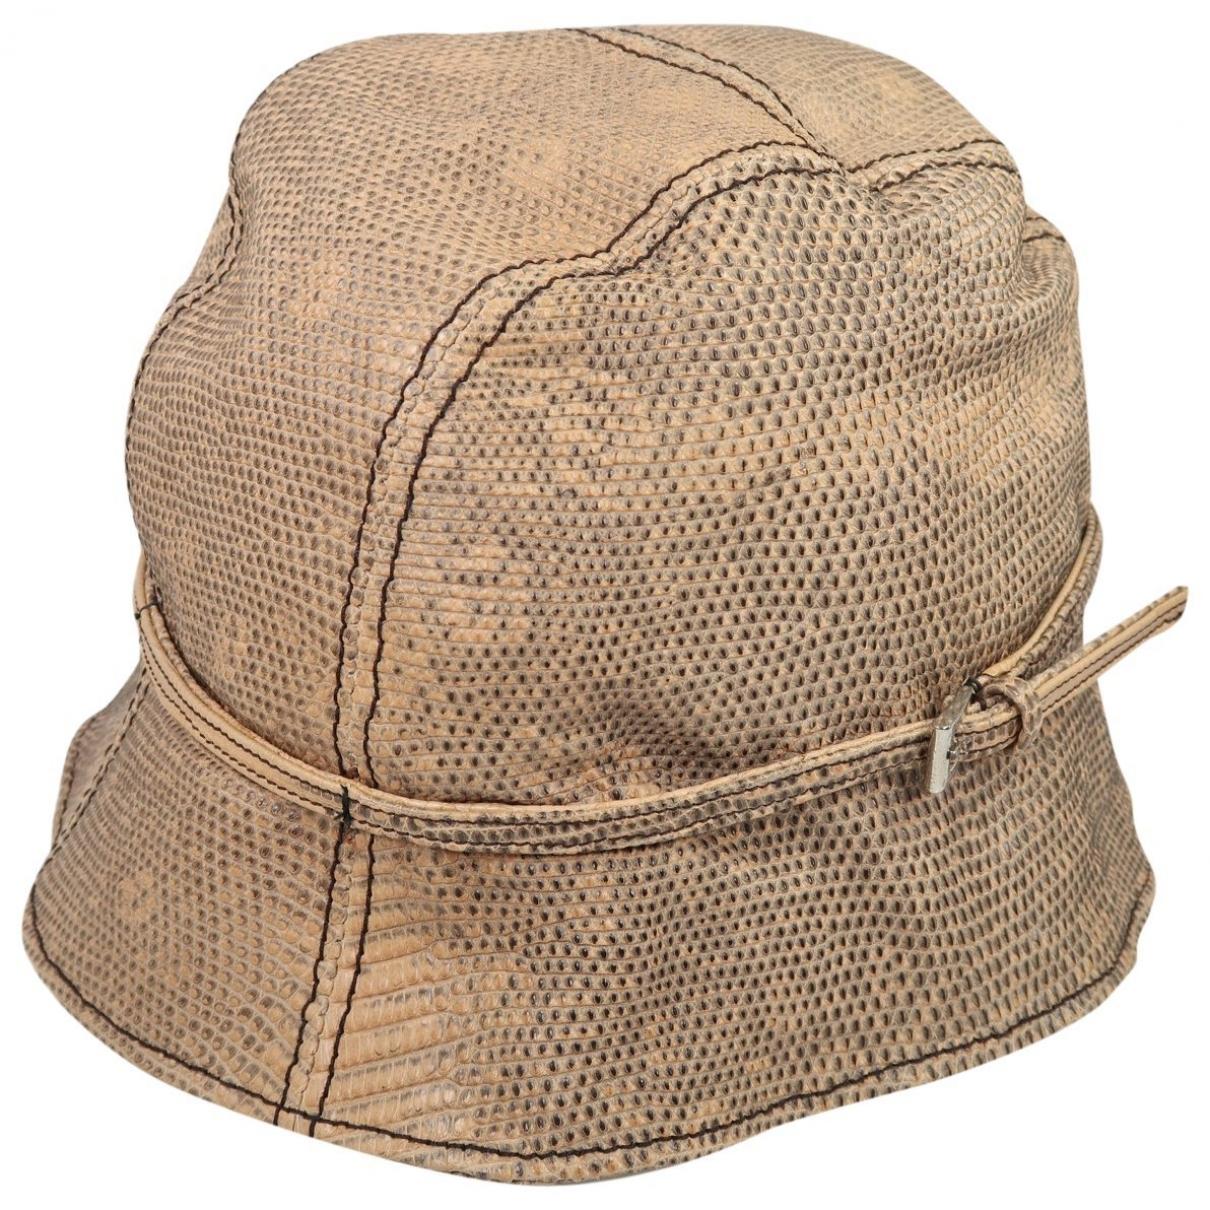 Prada \N Leather hat for Women M International